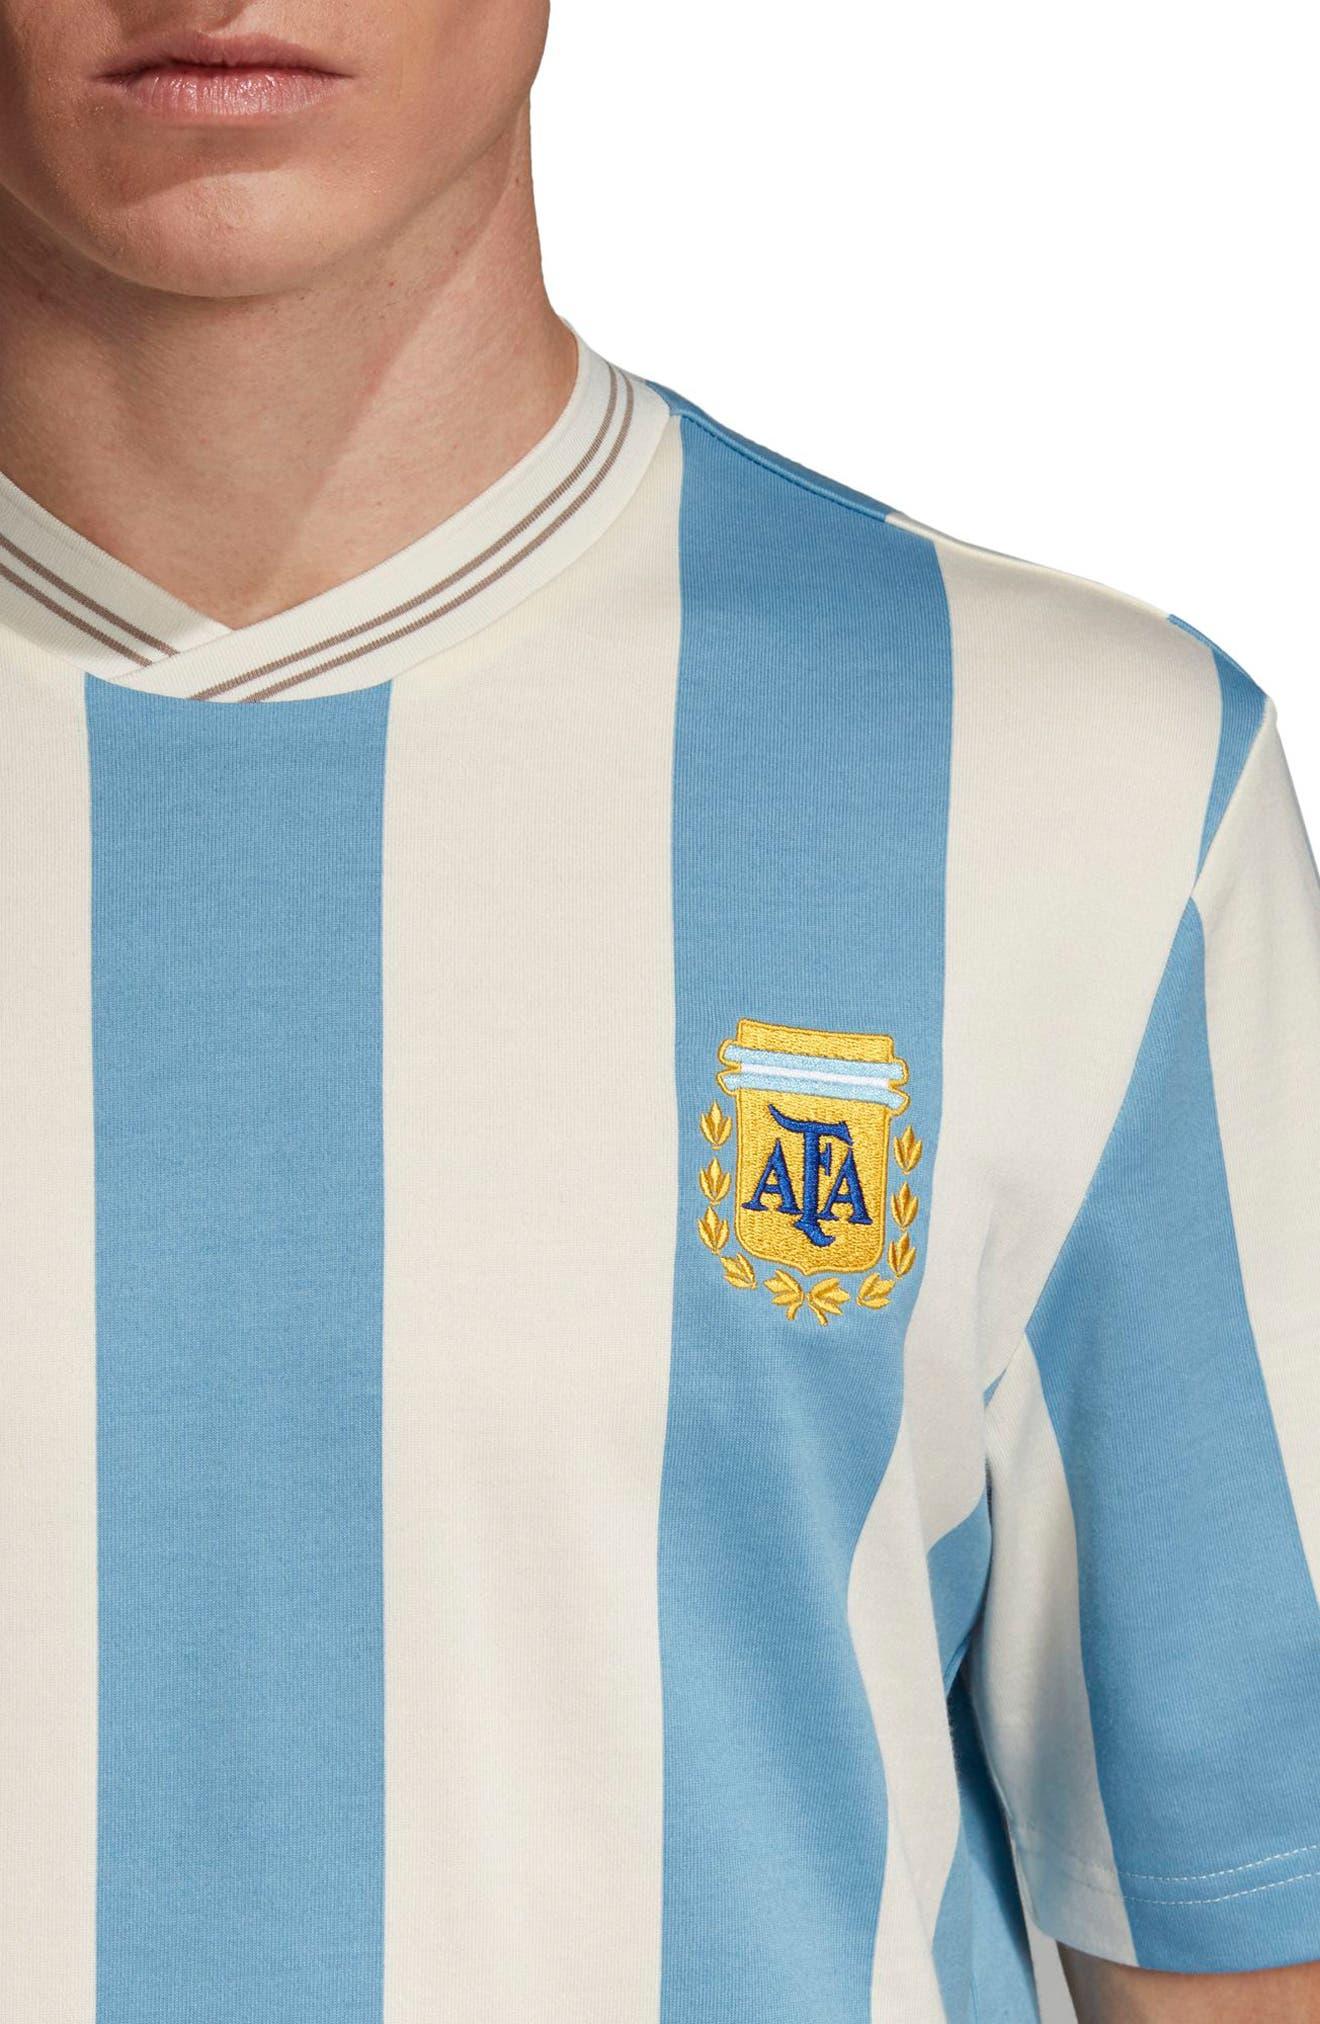 Argentina Mash-Up Jersey,                             Alternate thumbnail 4, color,                             Shade Blue/ Echo Whit